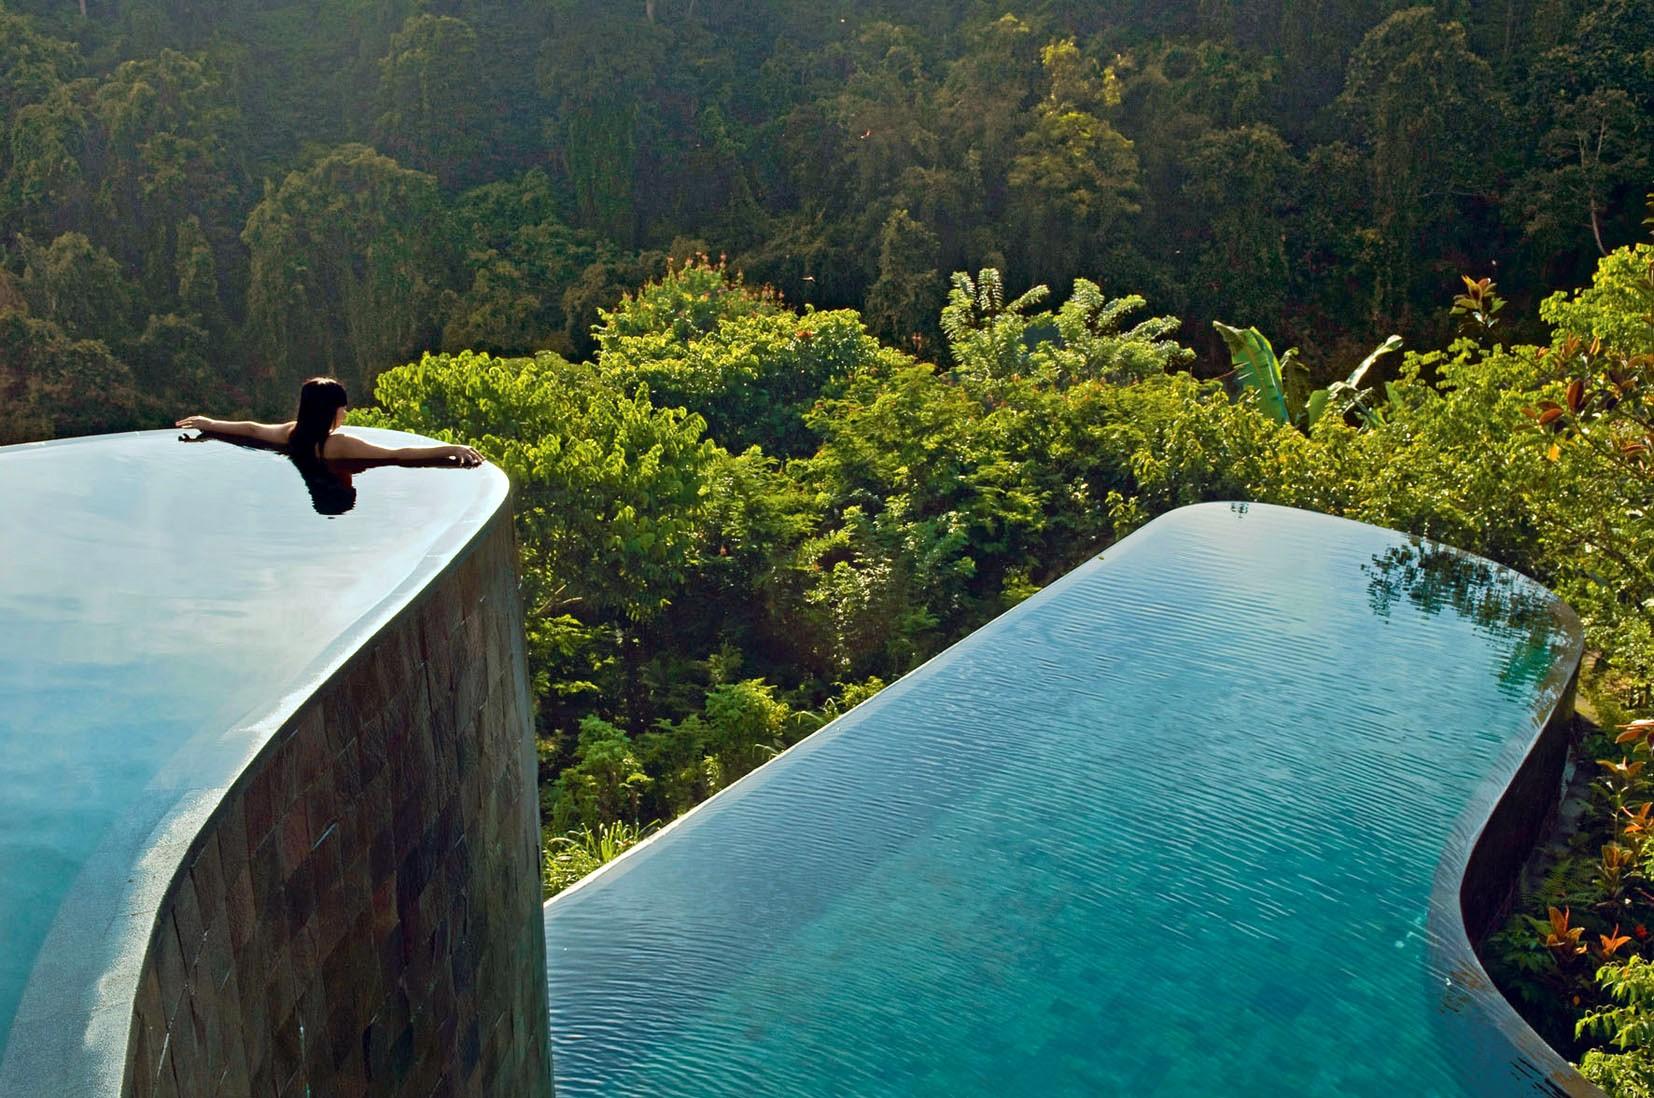 Hidden Palace at Hanging Gardens of Bali